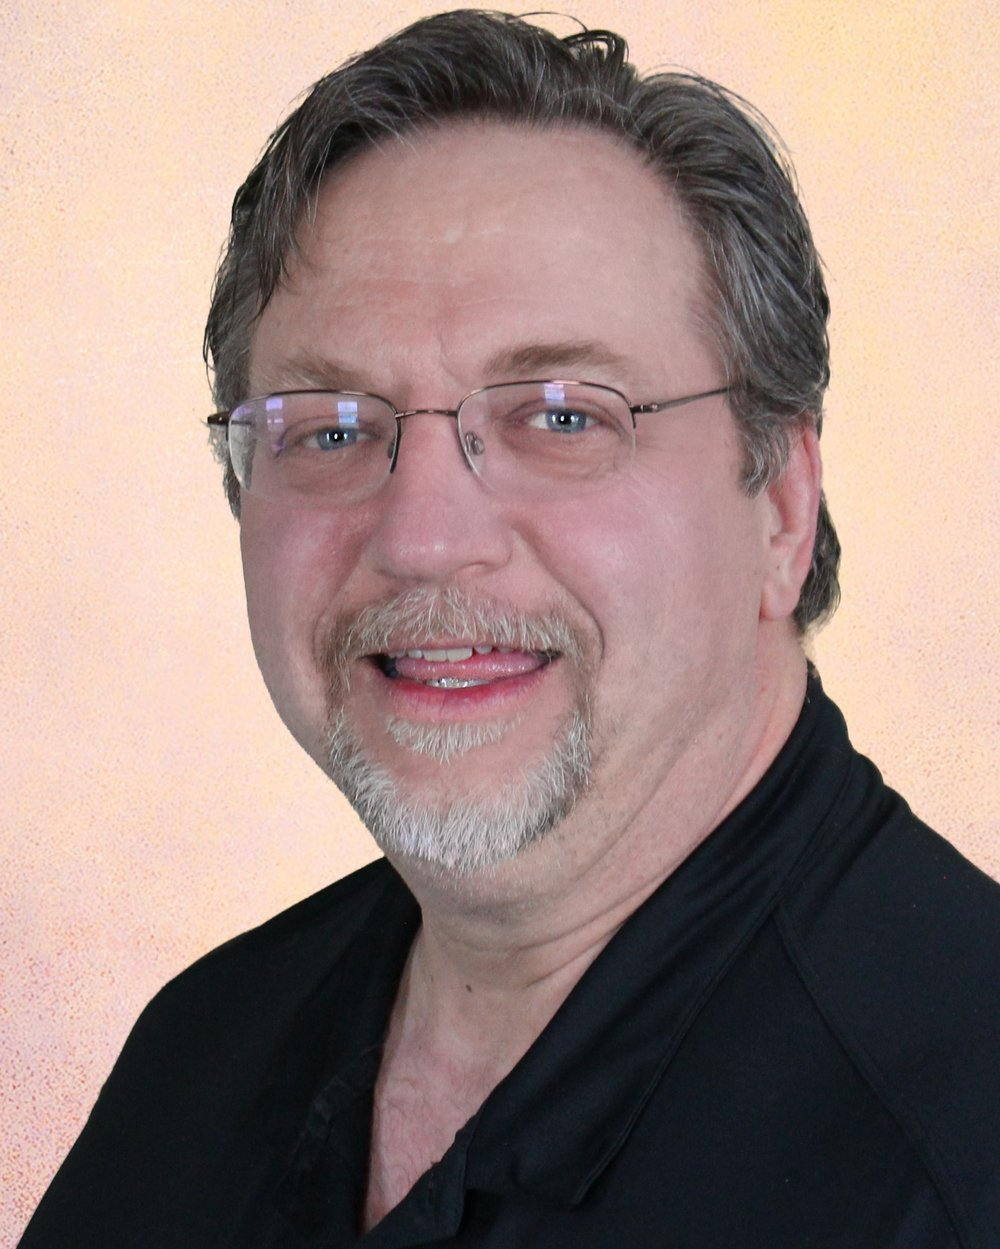 Scott Ristow